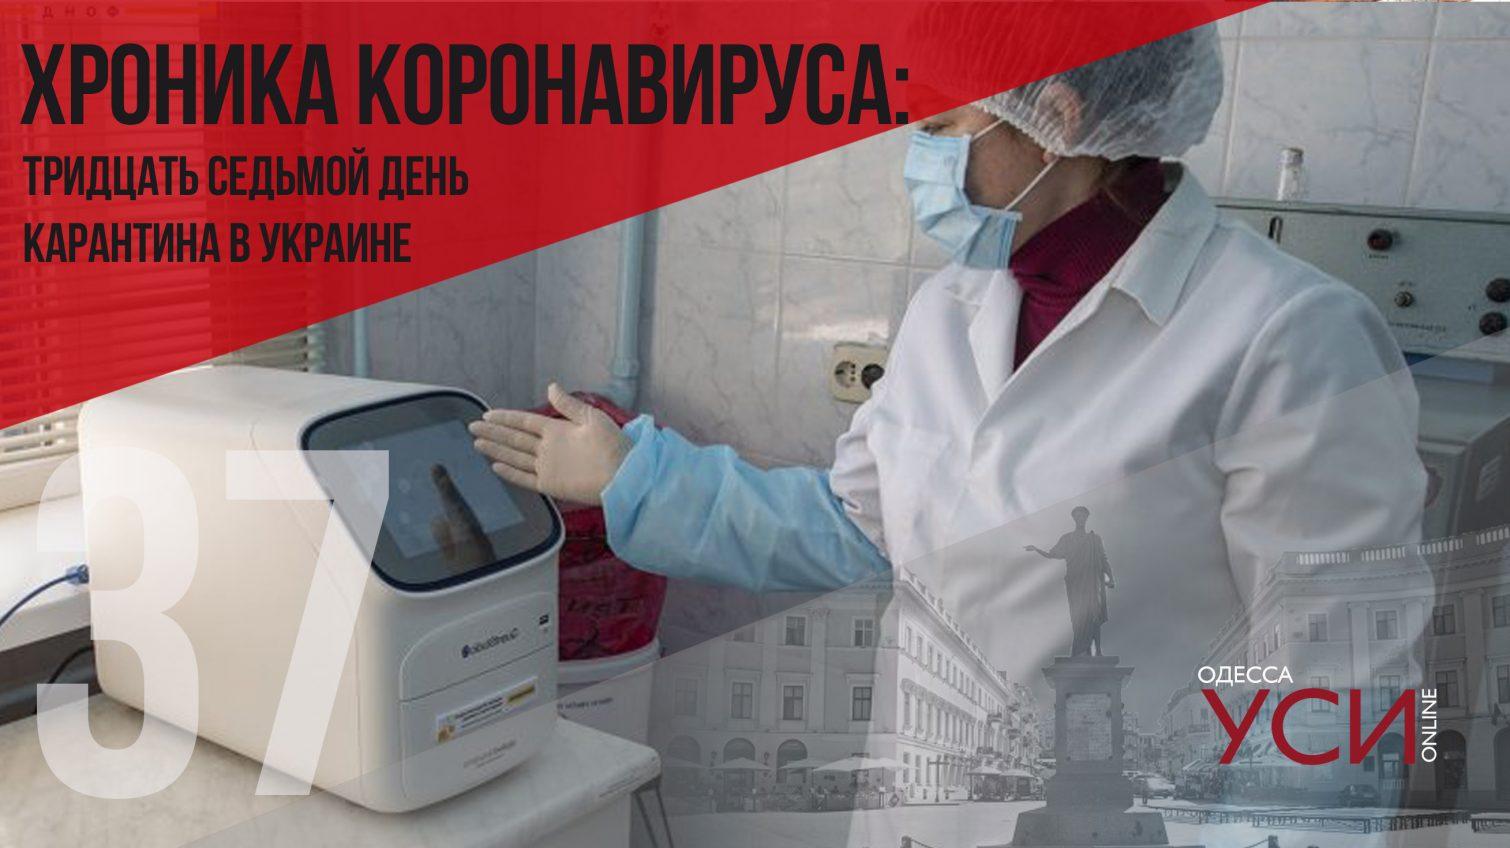 Хроника коронавируса: 37 дней с начала карантина в Украине ОБНОВЛЯЕТСЯ «фото»